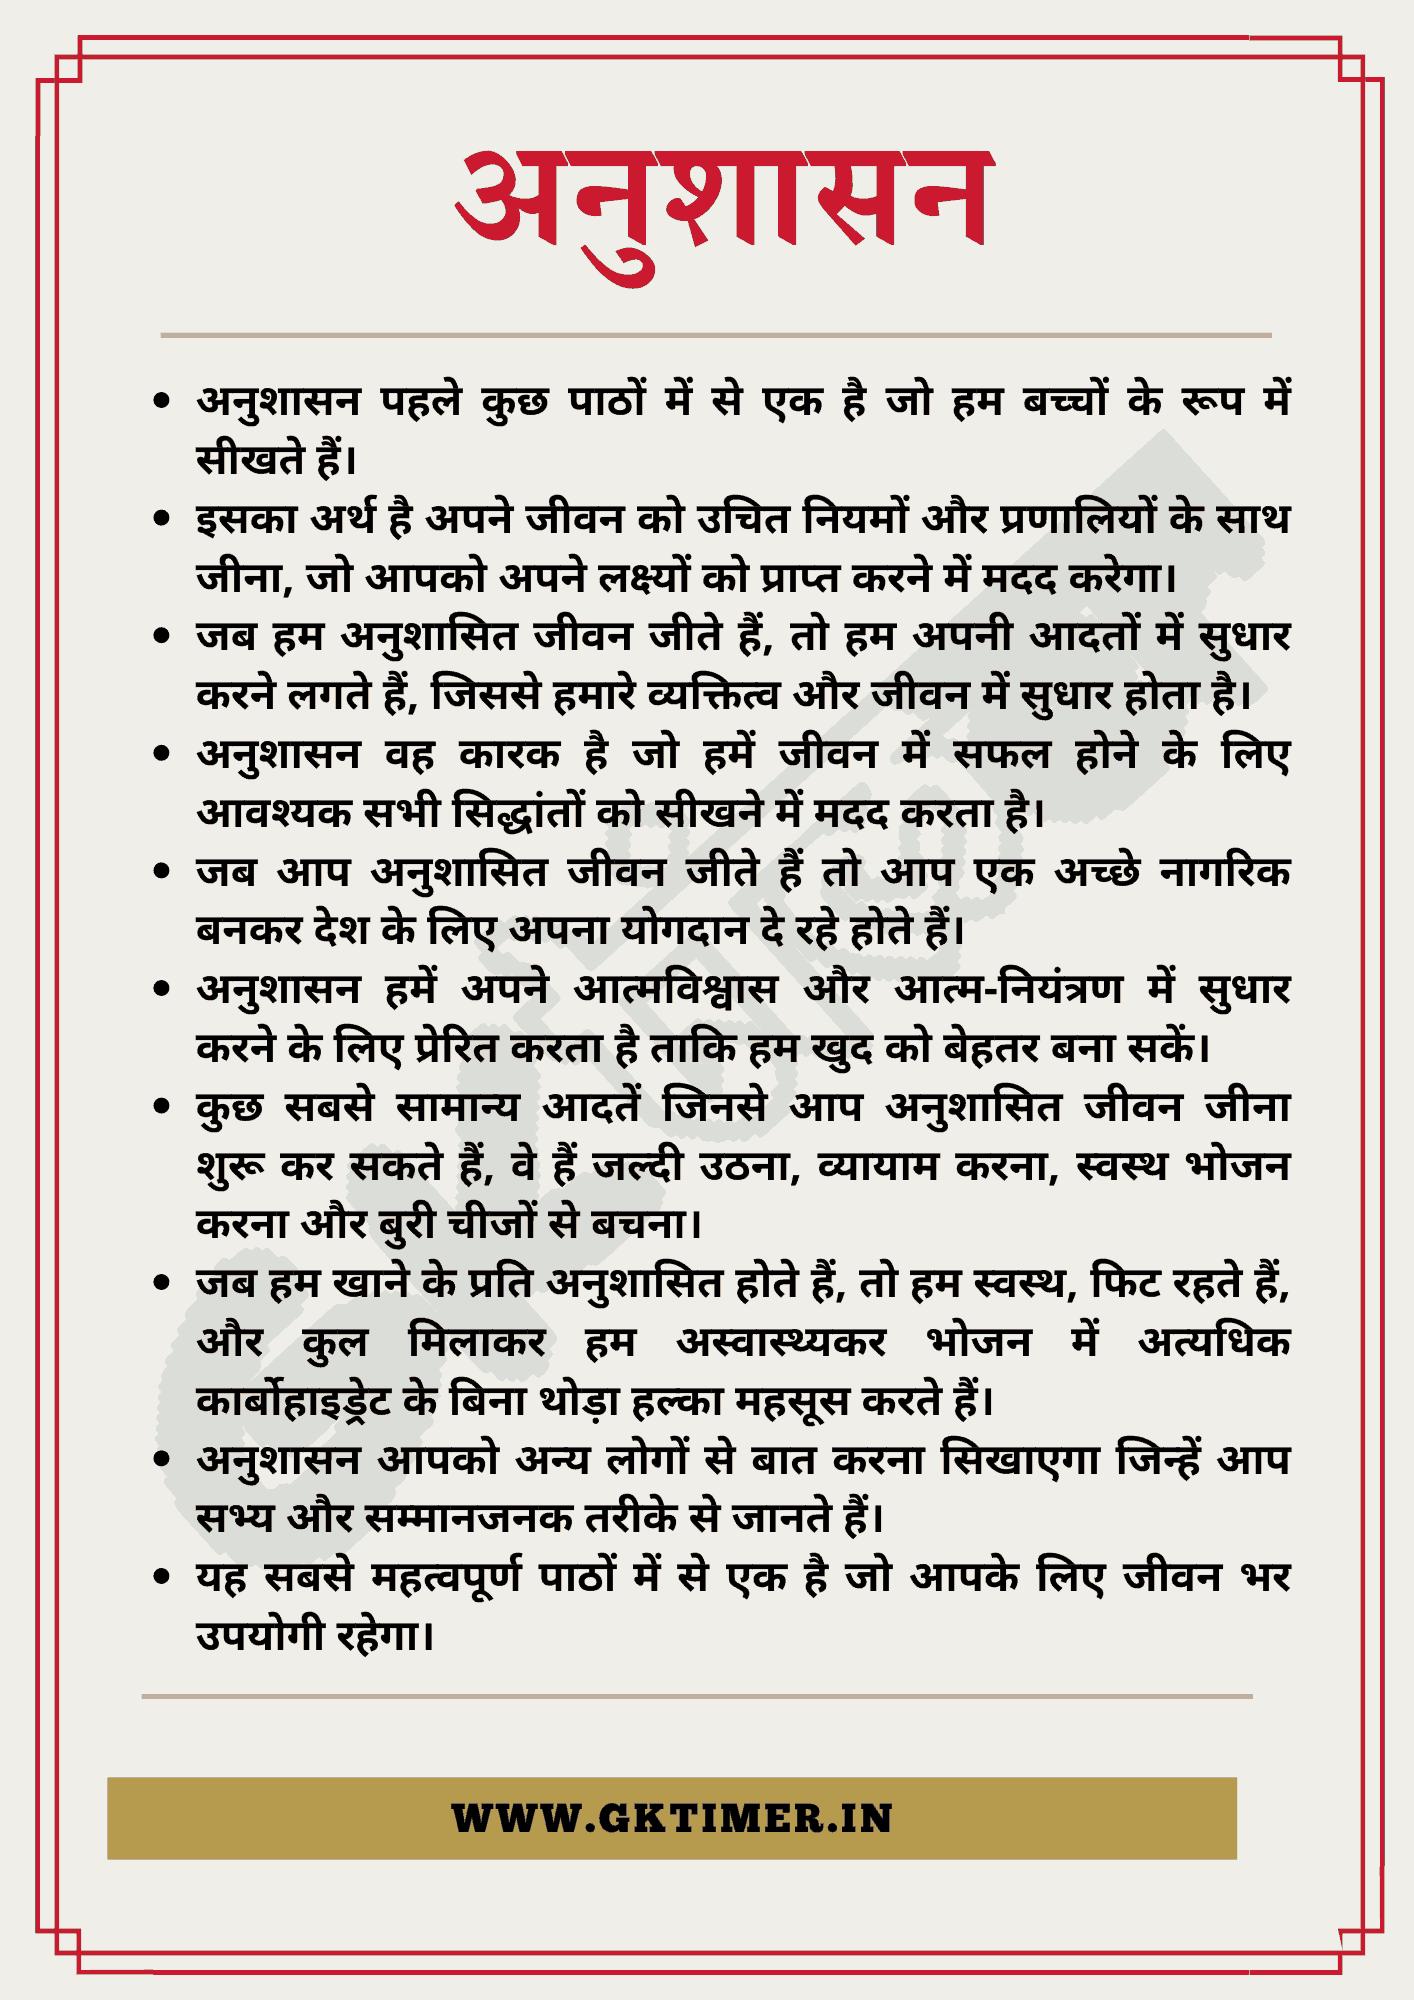 अनुशासन पर निबंध | Essay on Discipline in Hindi | 10 Lines on Discipline in Hindi